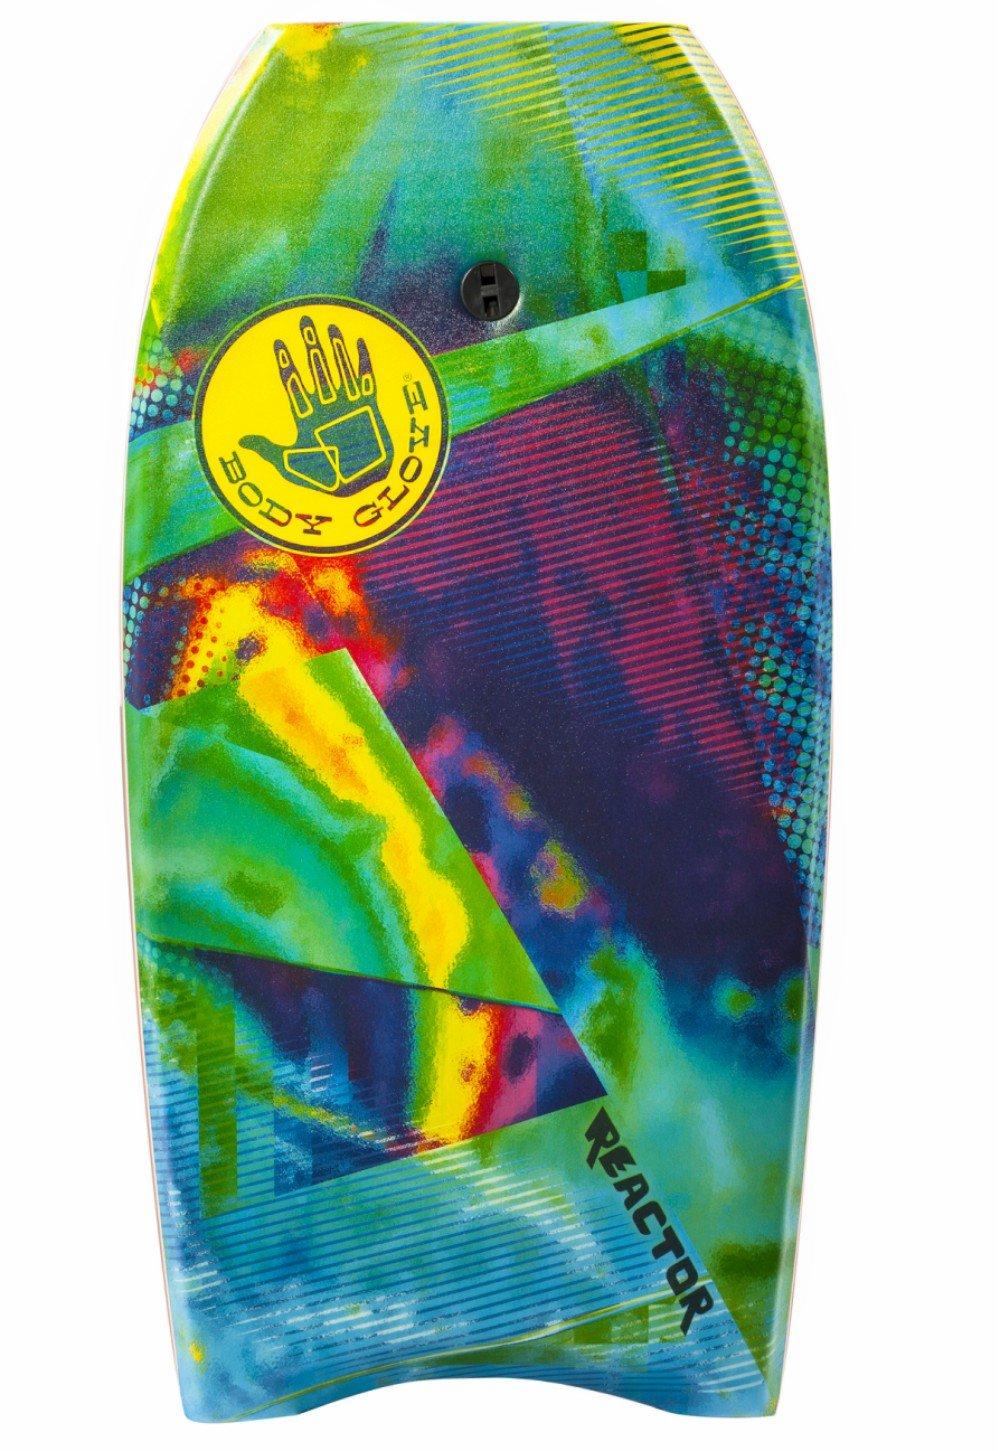 "Body Glove 16512 Reactor Body Board, Green, 41"" 41"" Body Glove Wetsuit Co. 16512-41""-ACID"